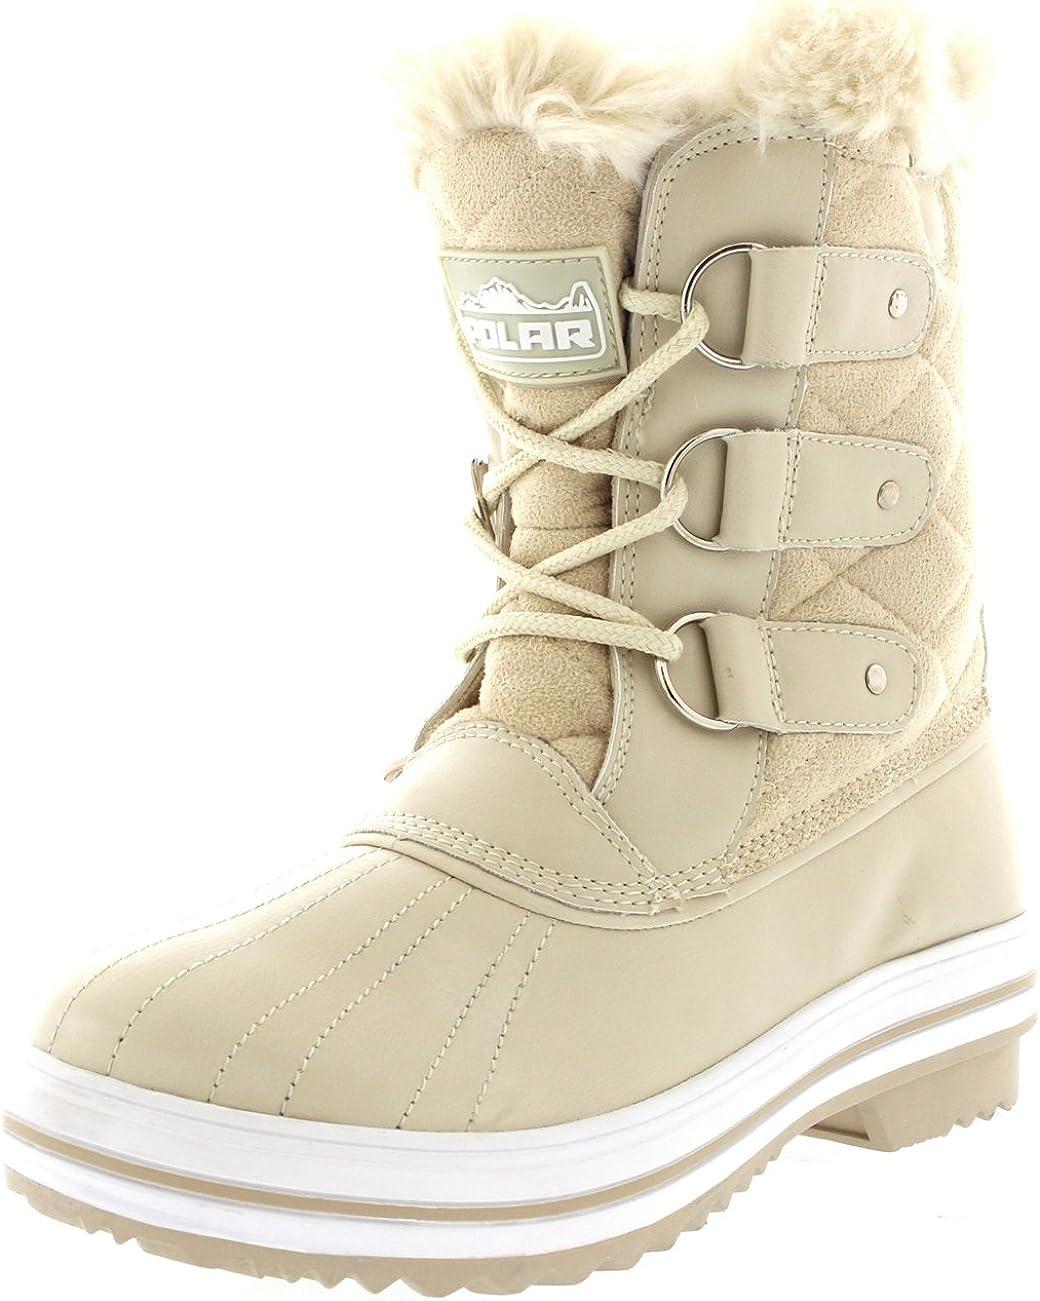 Womens Snow Boot Quilted Short Winter Snow Rain Warm Waterproof